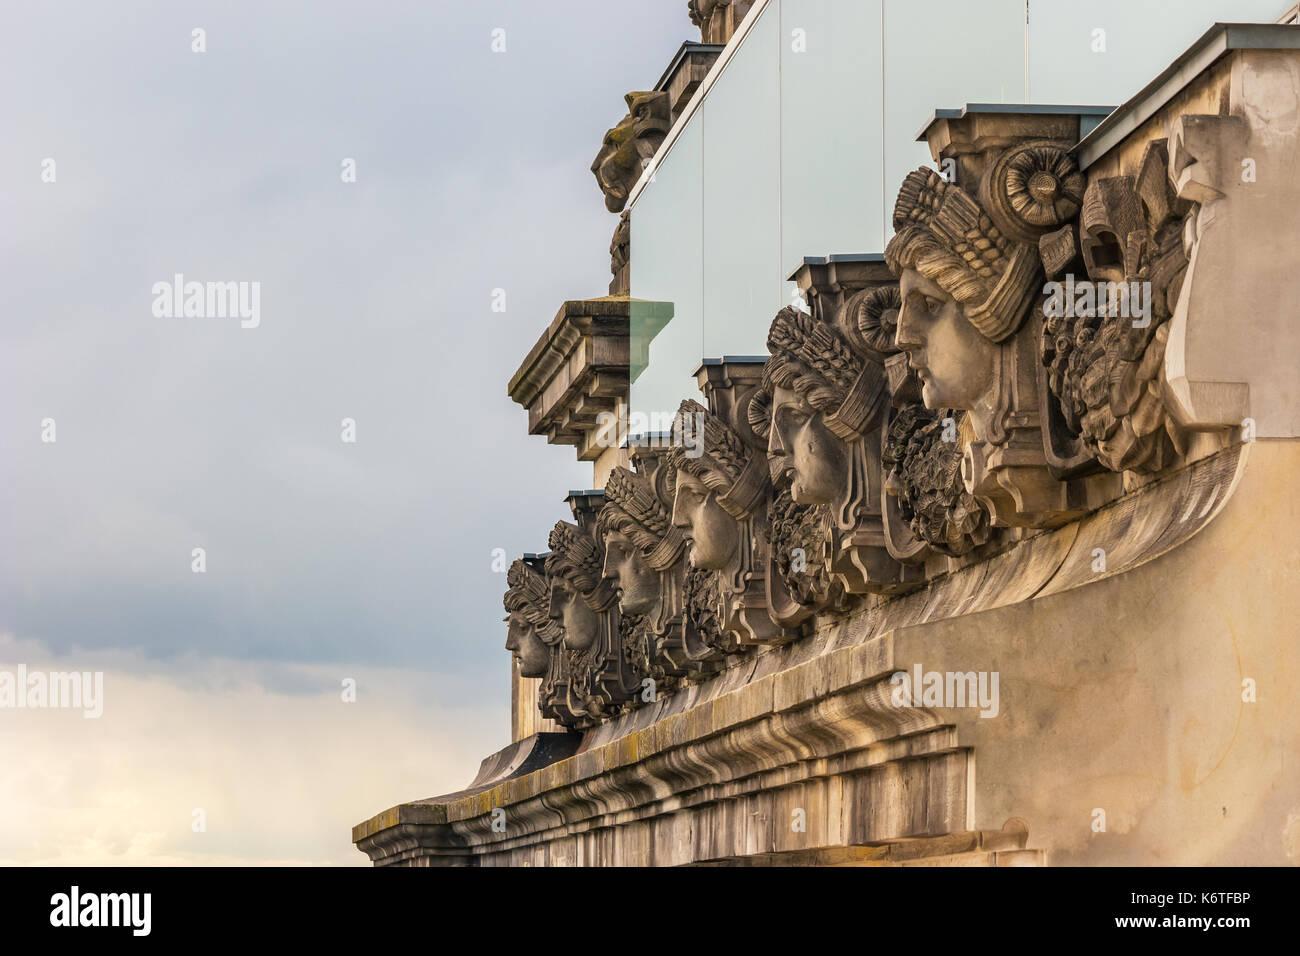 Visage de statue au Reichstag de Berlin (Bundestag), Berlin, Allemagne Photo Stock